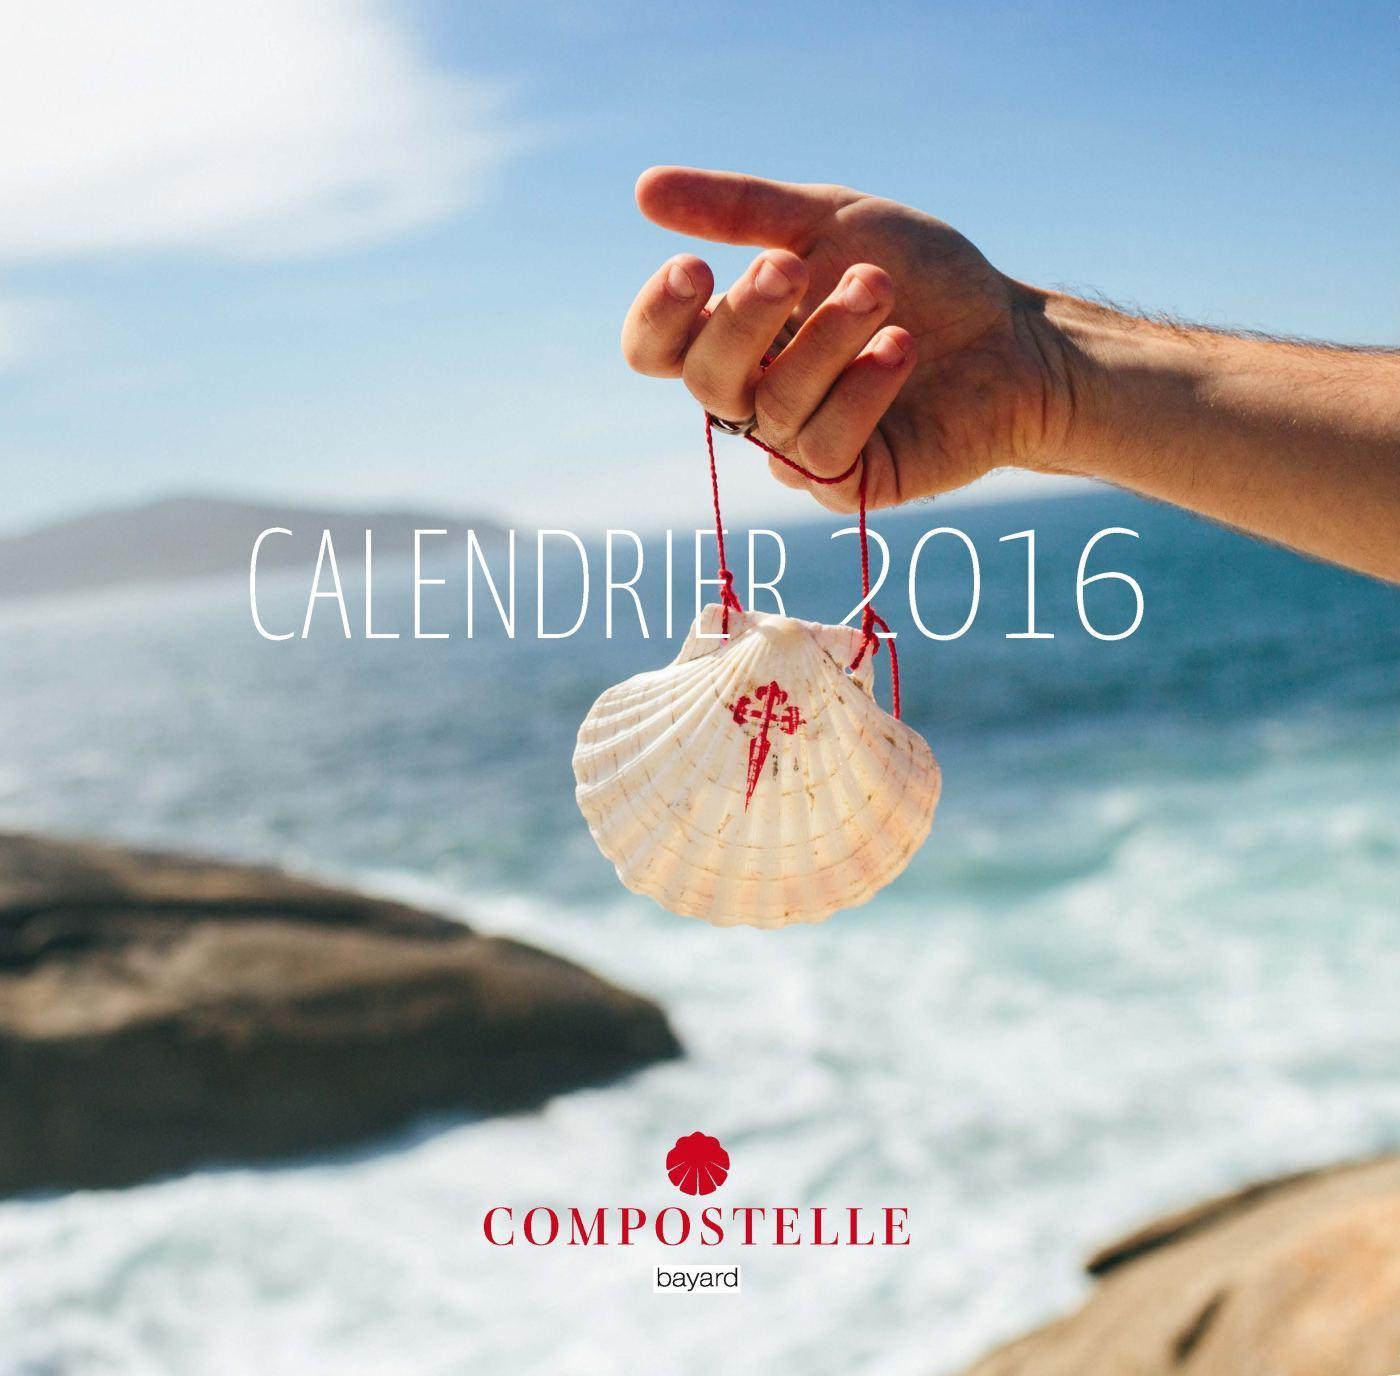 COMPOSTELLE CALENDRIER 2016